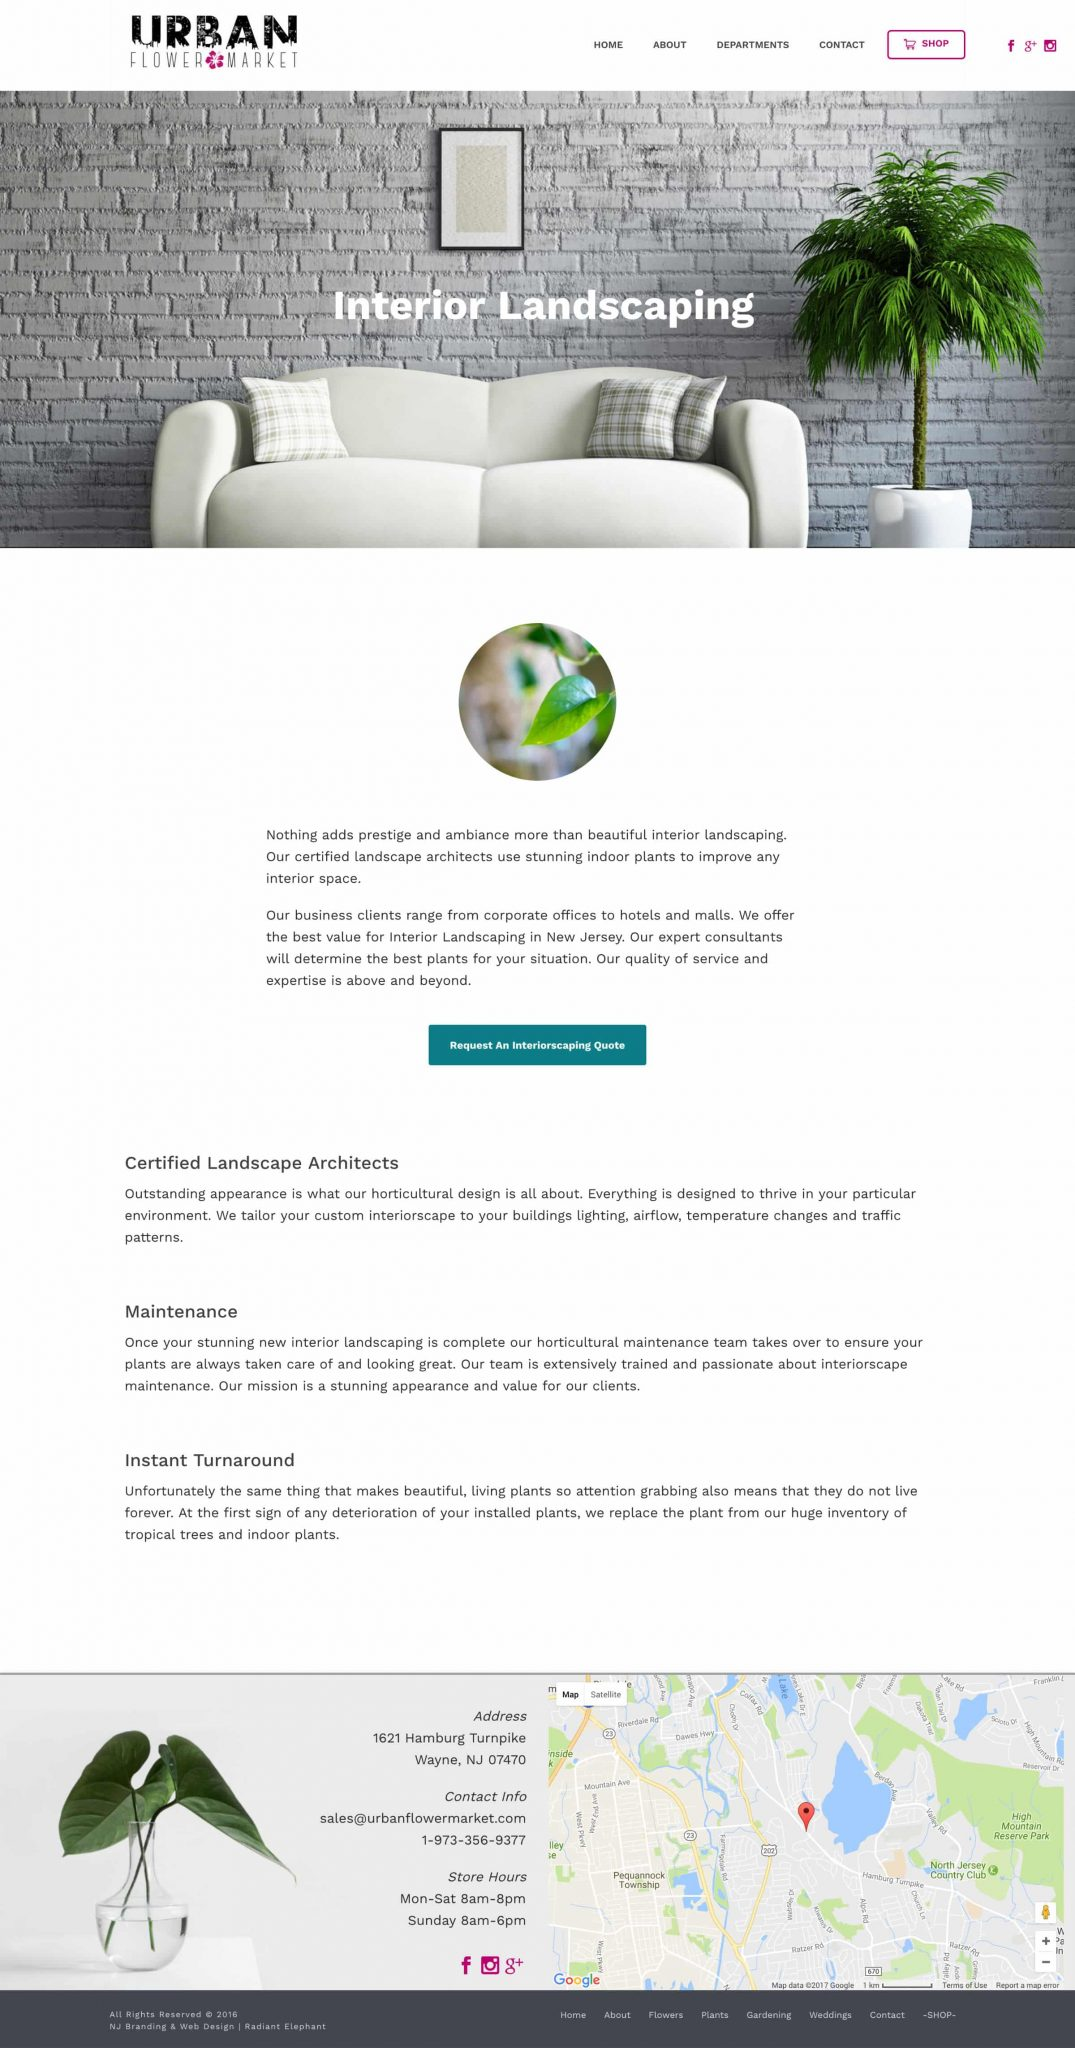 nj-web-design-interior-landscaping